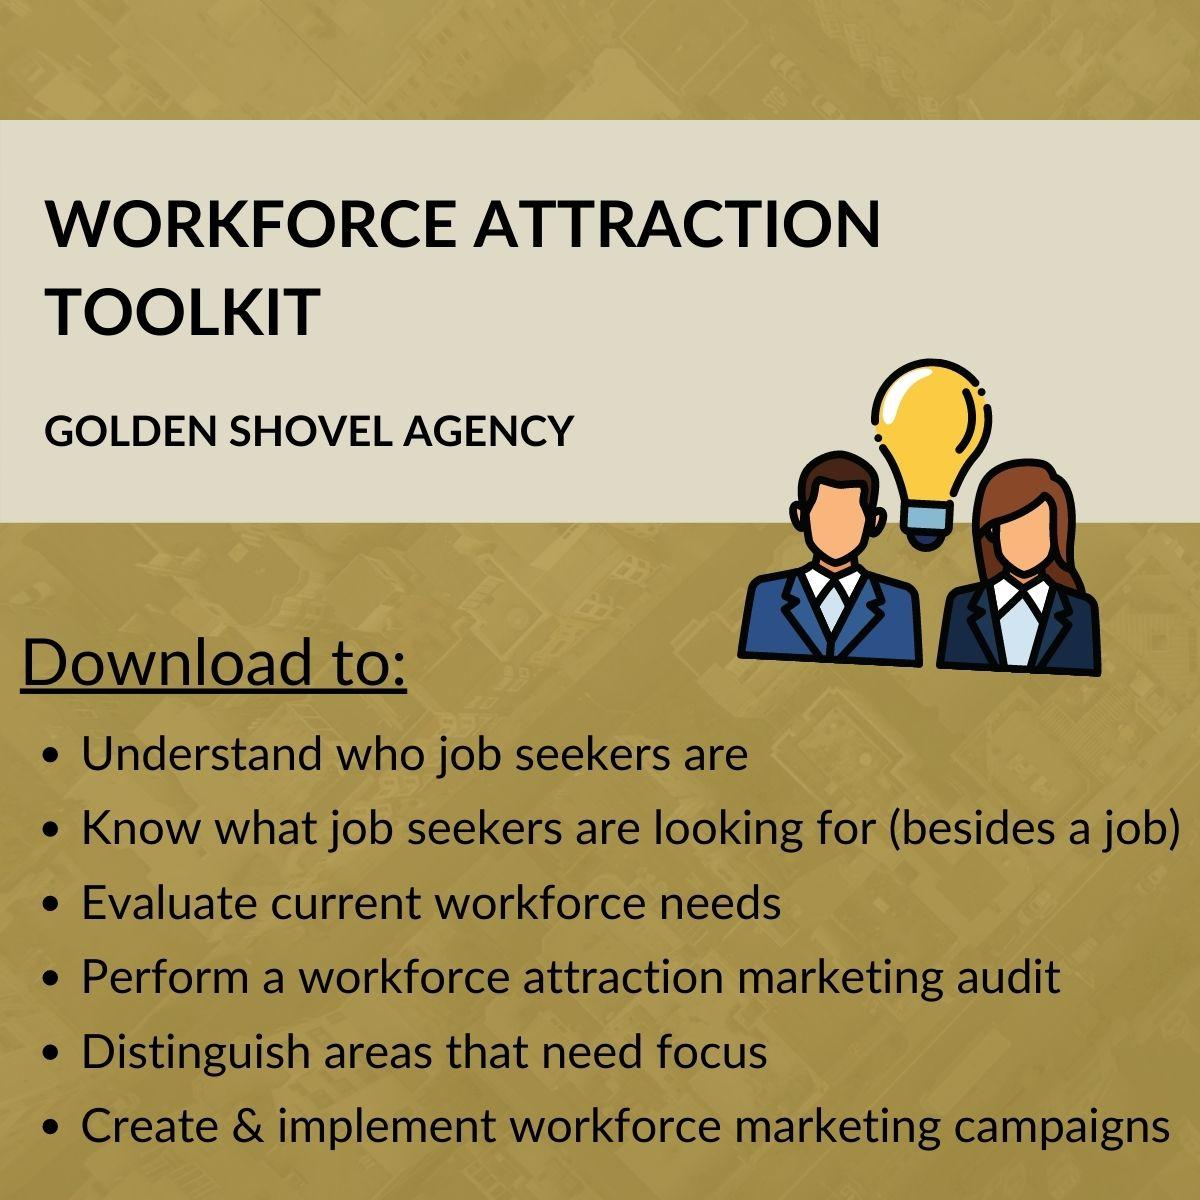 Workforce Attraction eBook Image